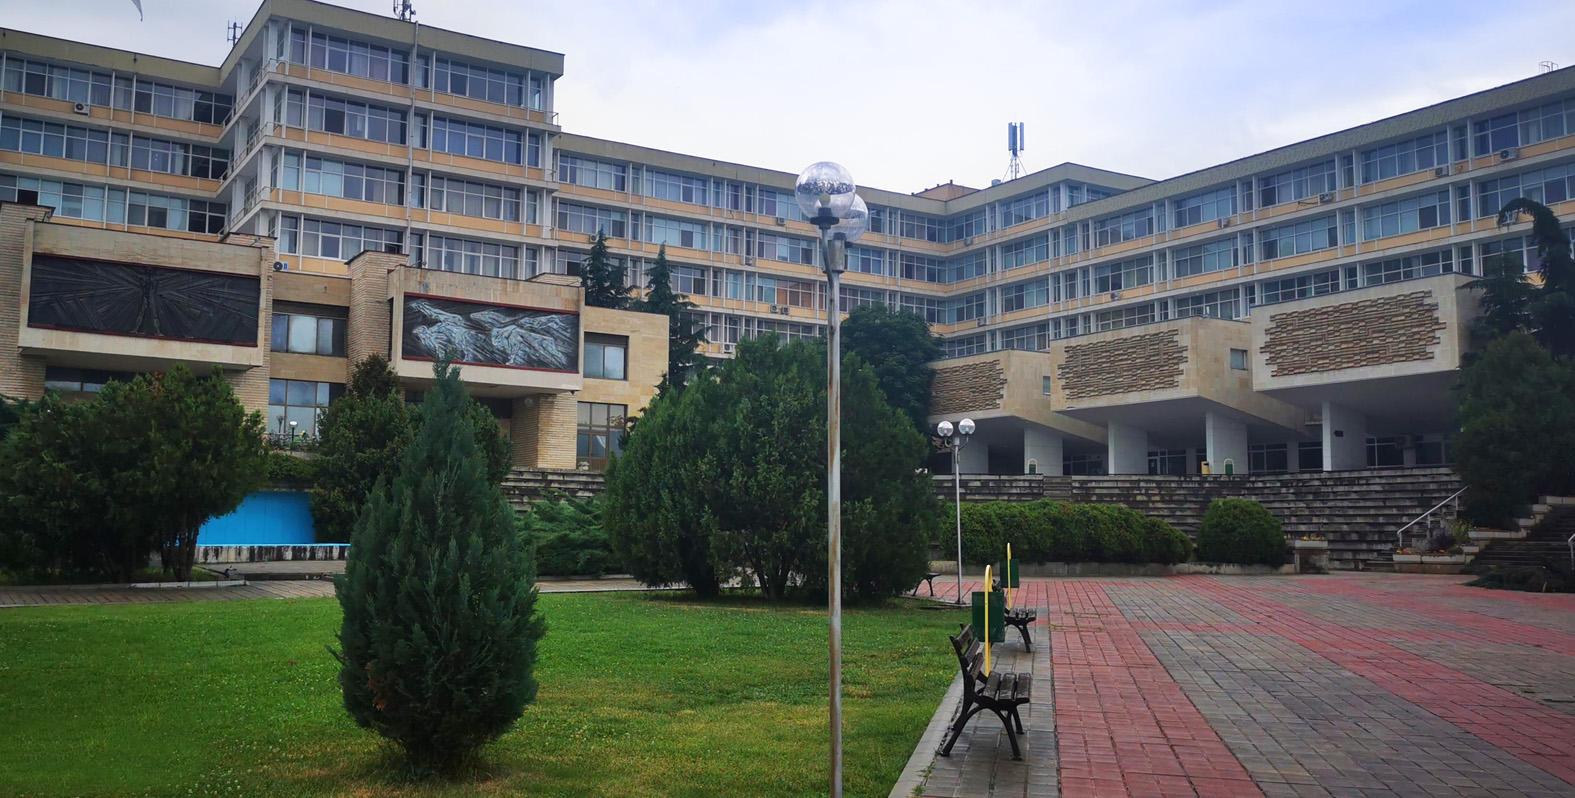 Widok kampusu